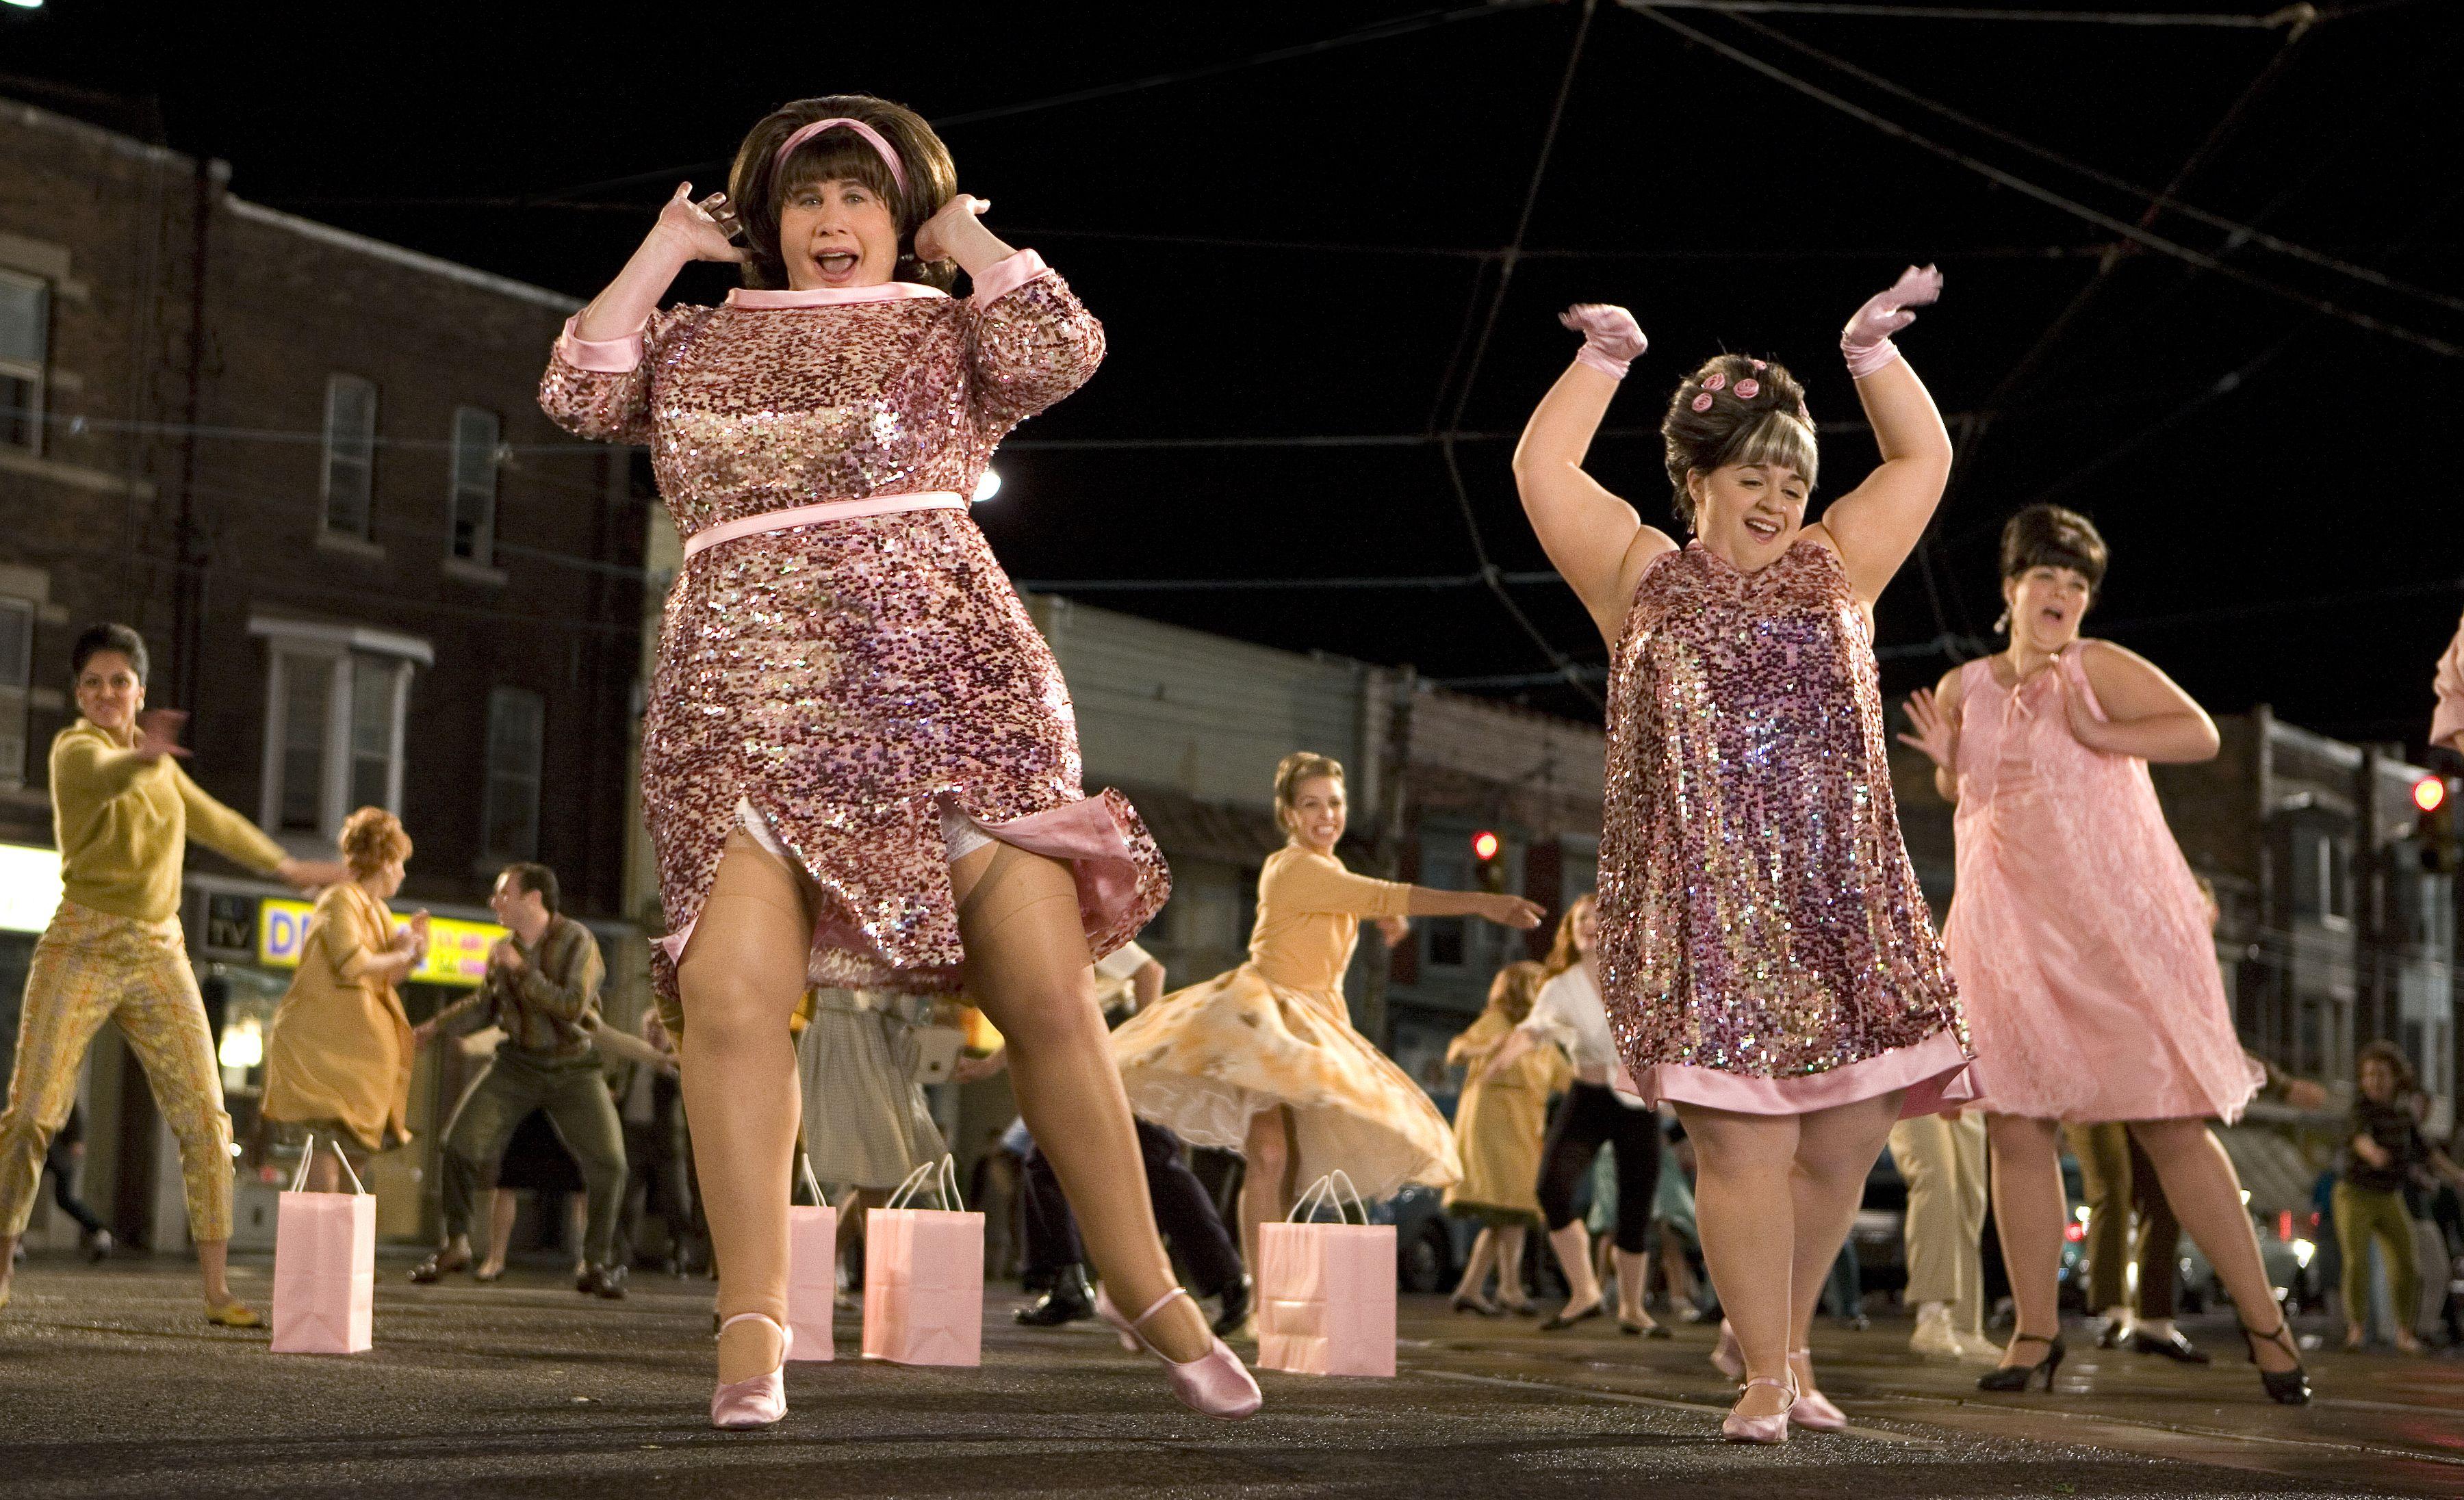 John Travolta & Nikki Blonsky in Hairspray, 2007